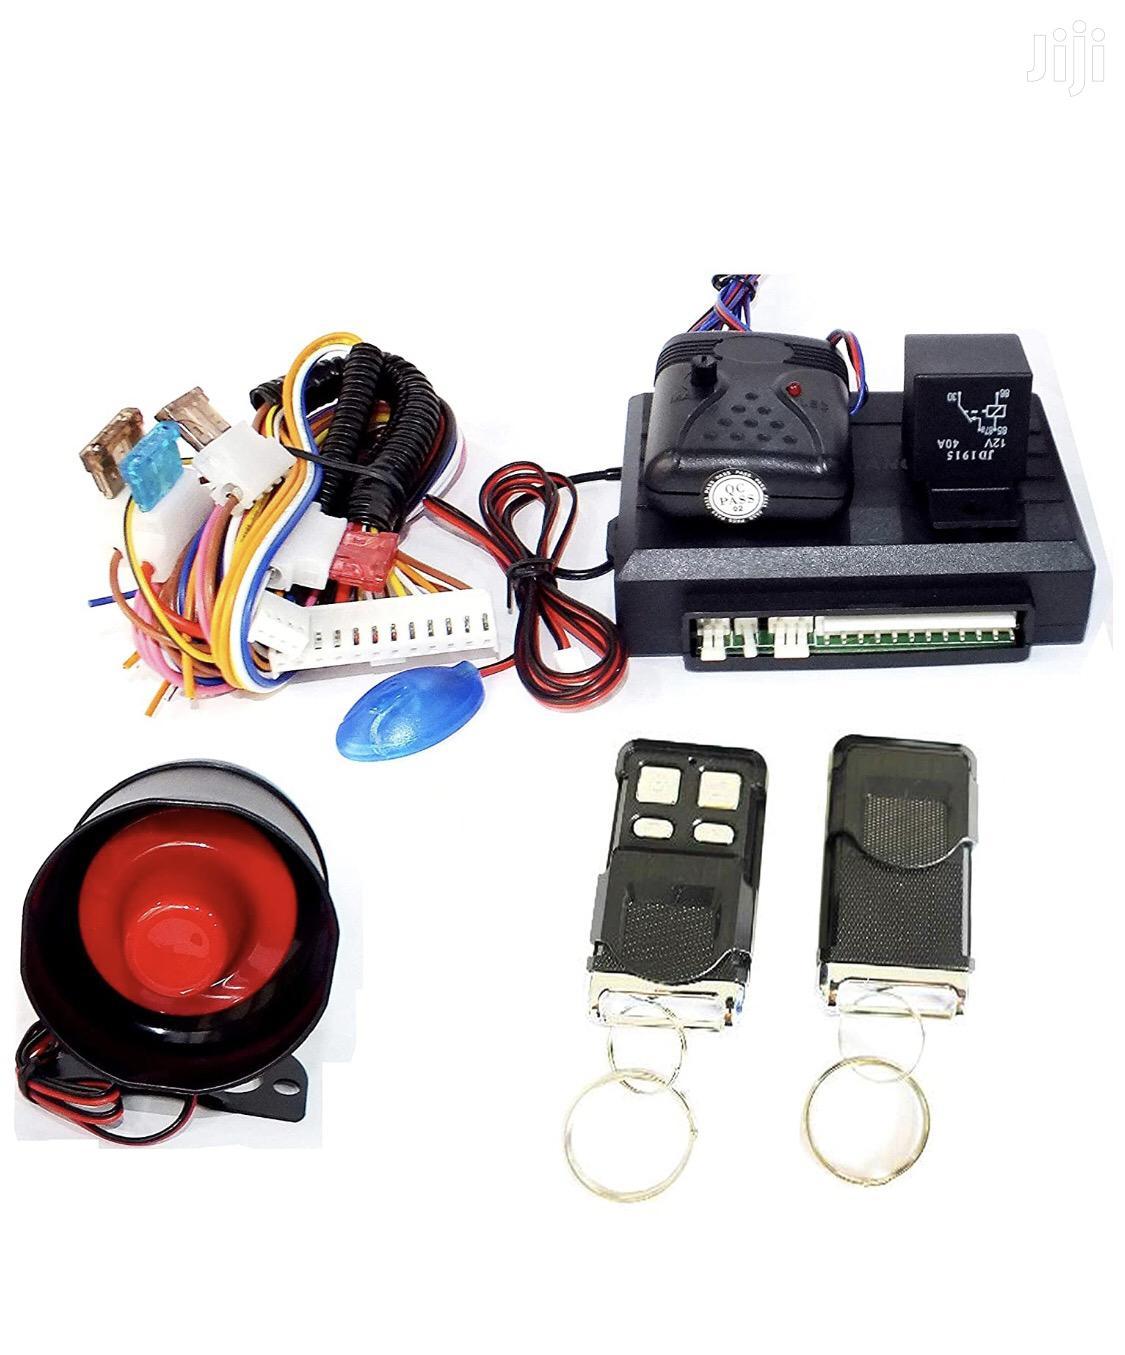 Universal Car Alarm With 2 Remote Control Key